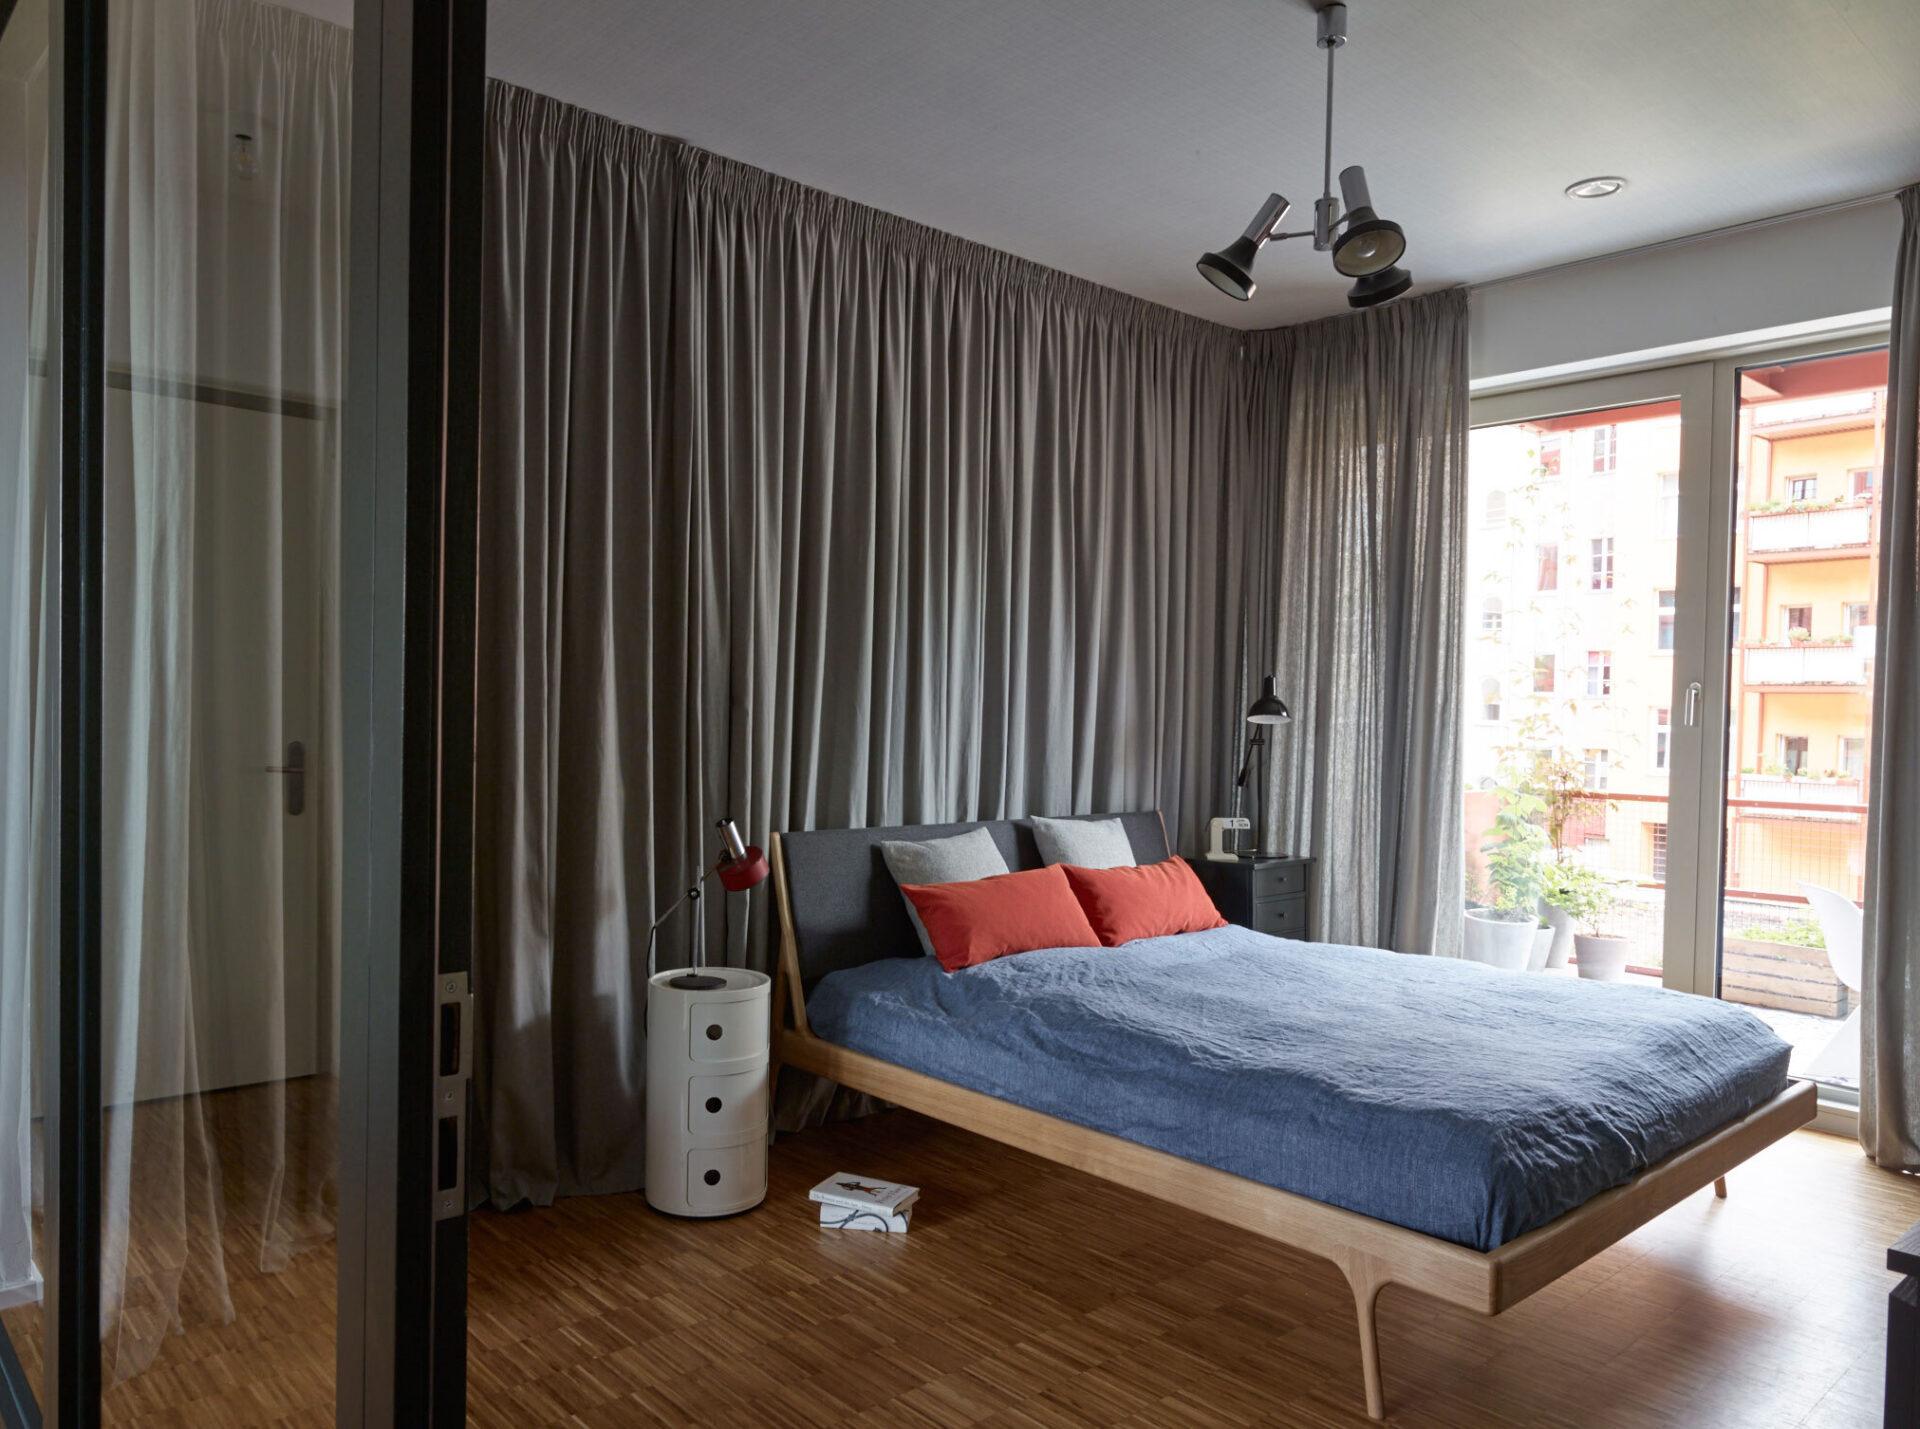 Antonius Schimmelbusch_Apartment Berlin_Ragnar Schmuck_privat_09